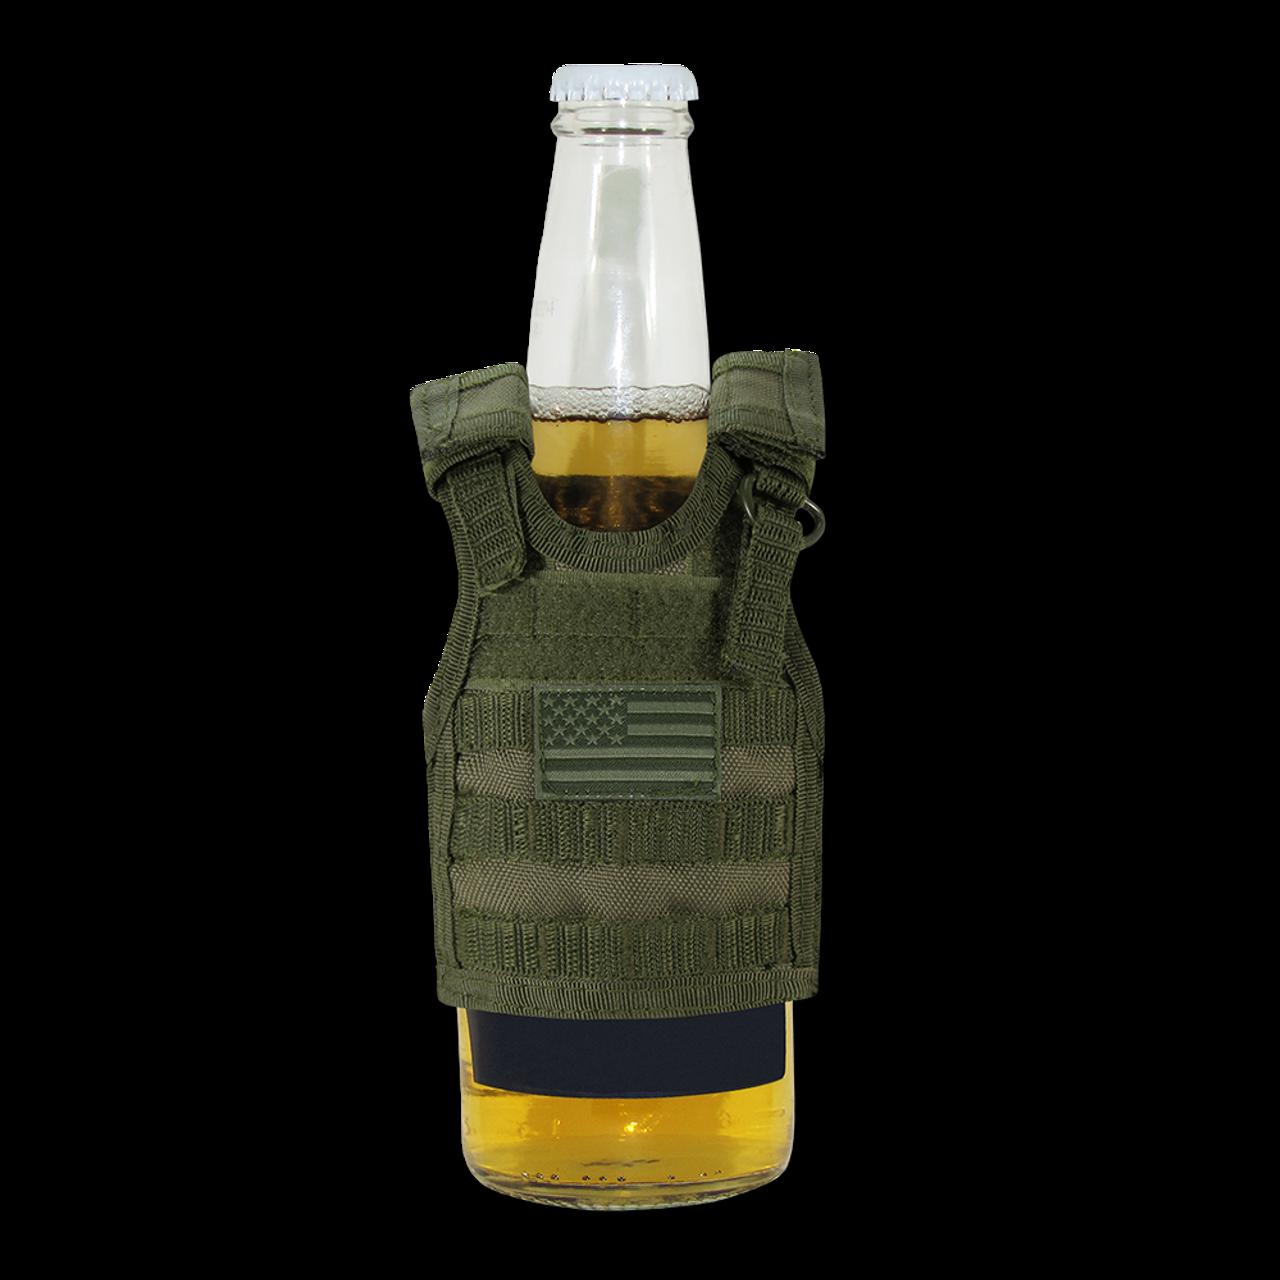 T99 - Tactical Mini Vest Bottle Koozie - USA Flag - Olive Drab -  USMILITARYHATS.COM d1797276d00